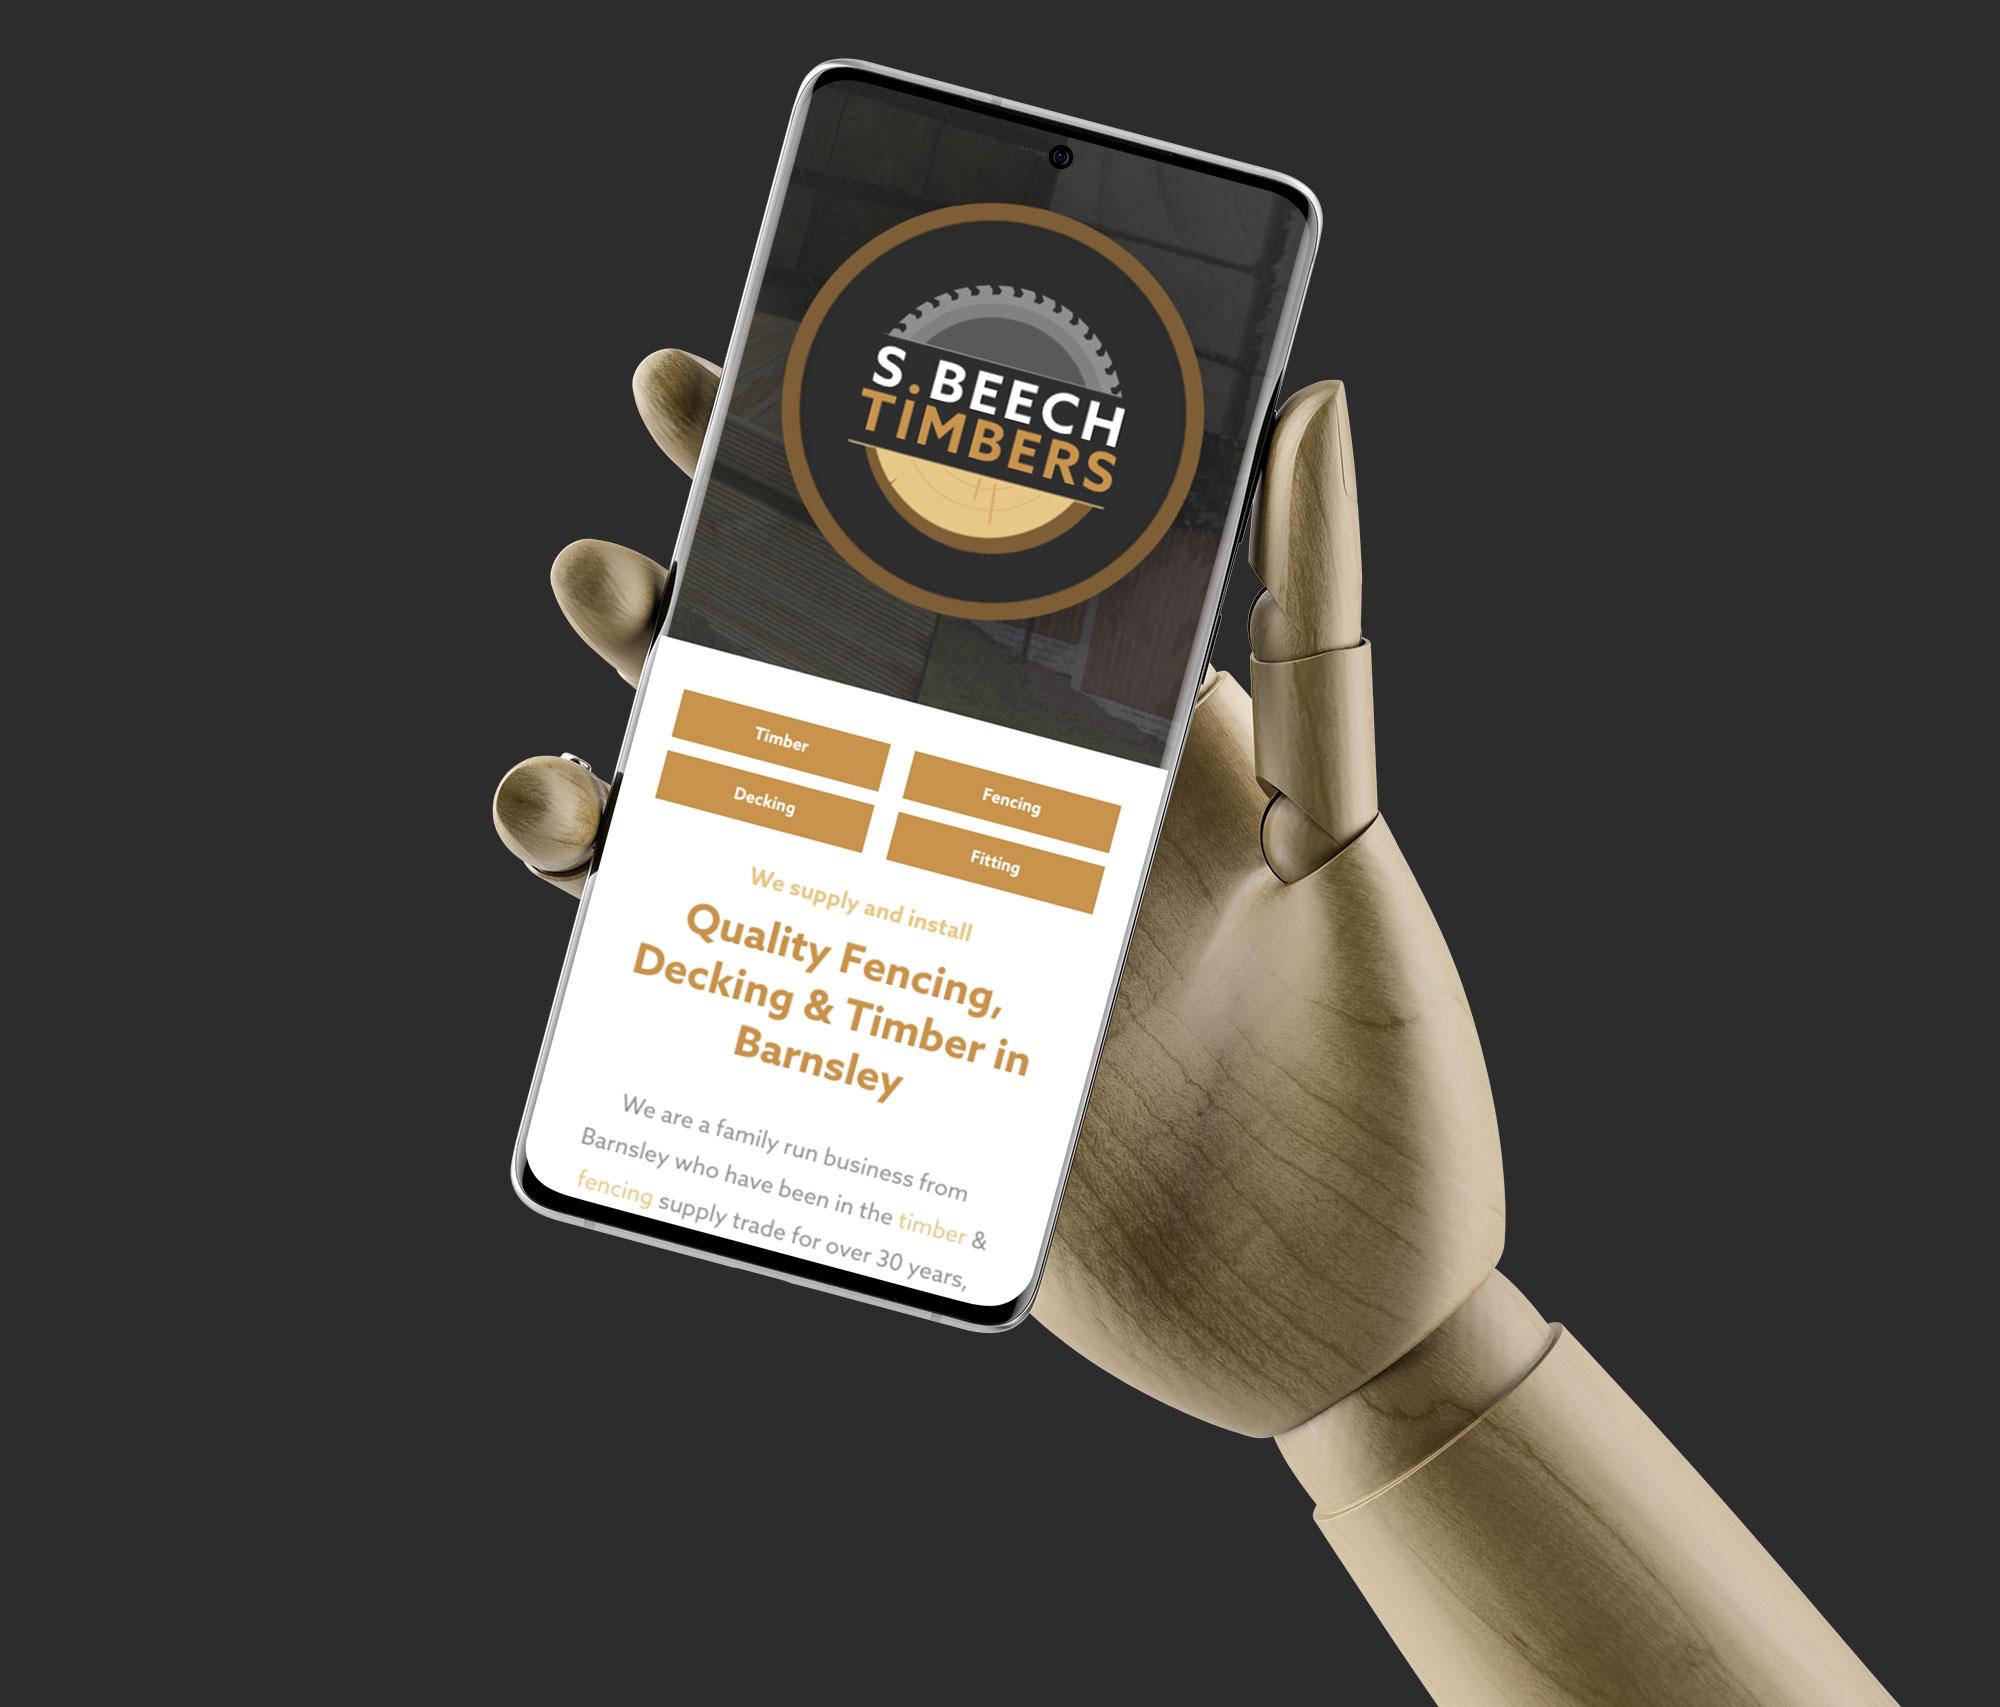 S Beech Timbers Website